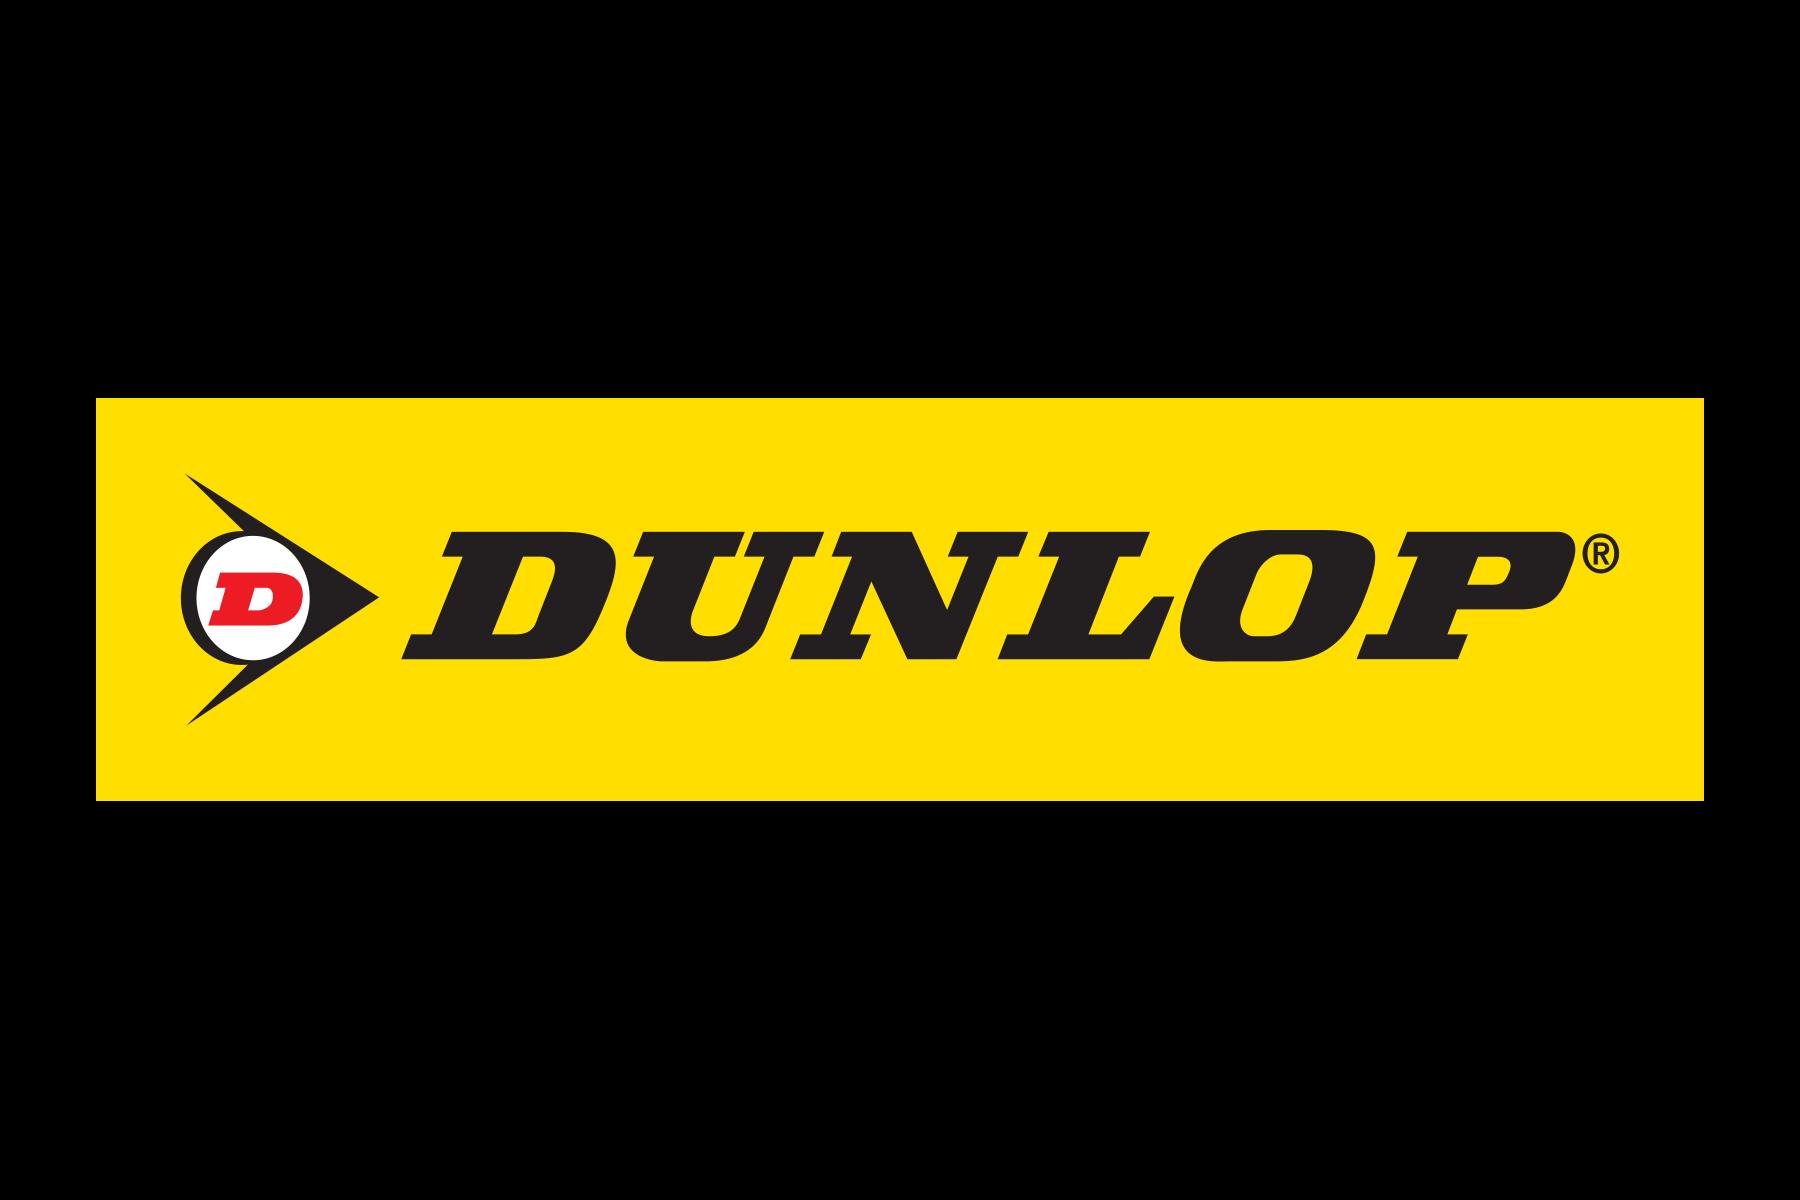 dunlop-png-dunlop-png-1800 (1)